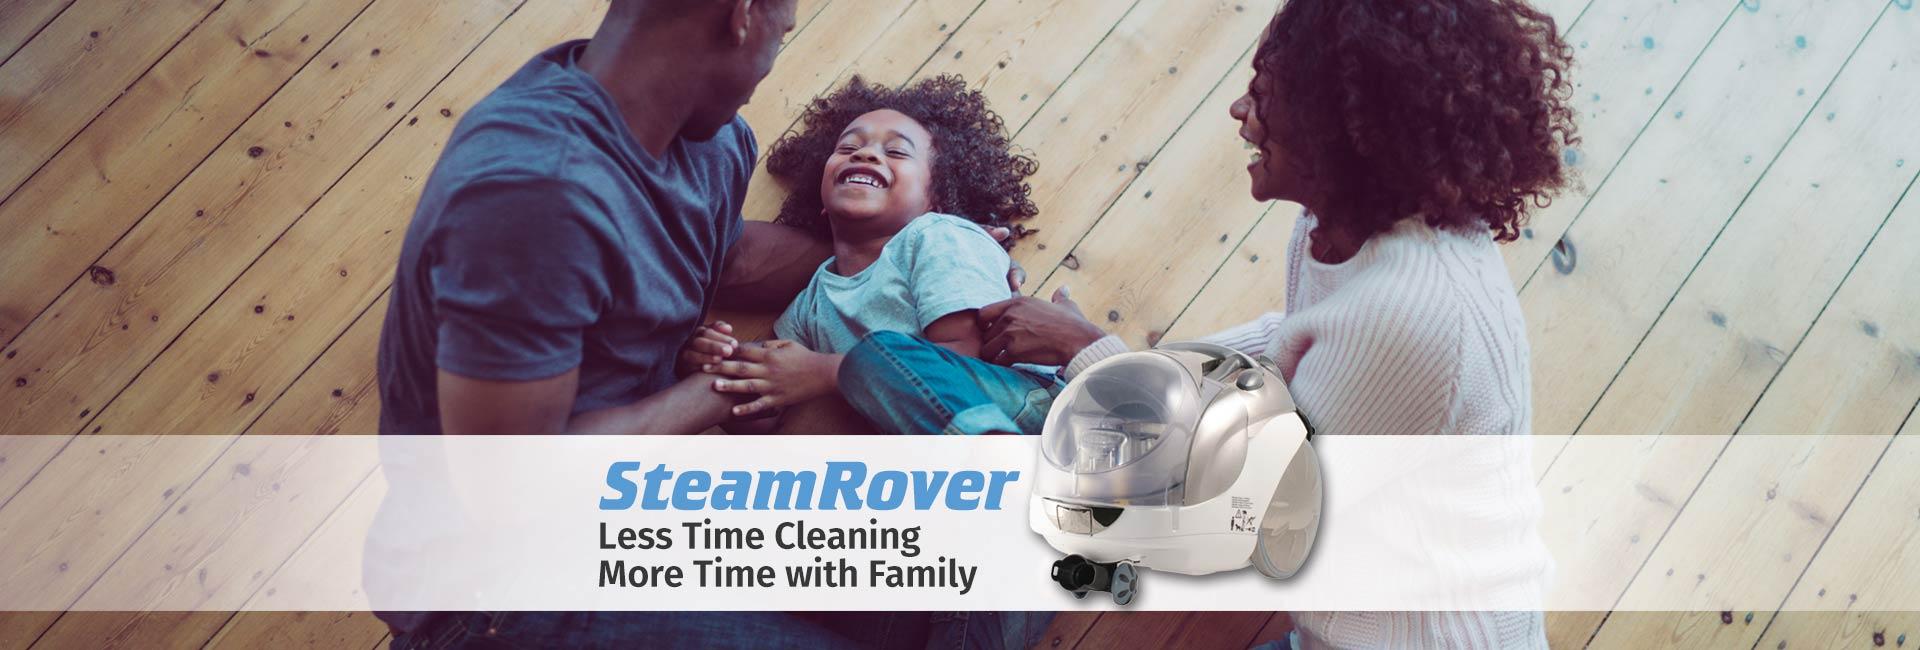 steamrover_cleaner